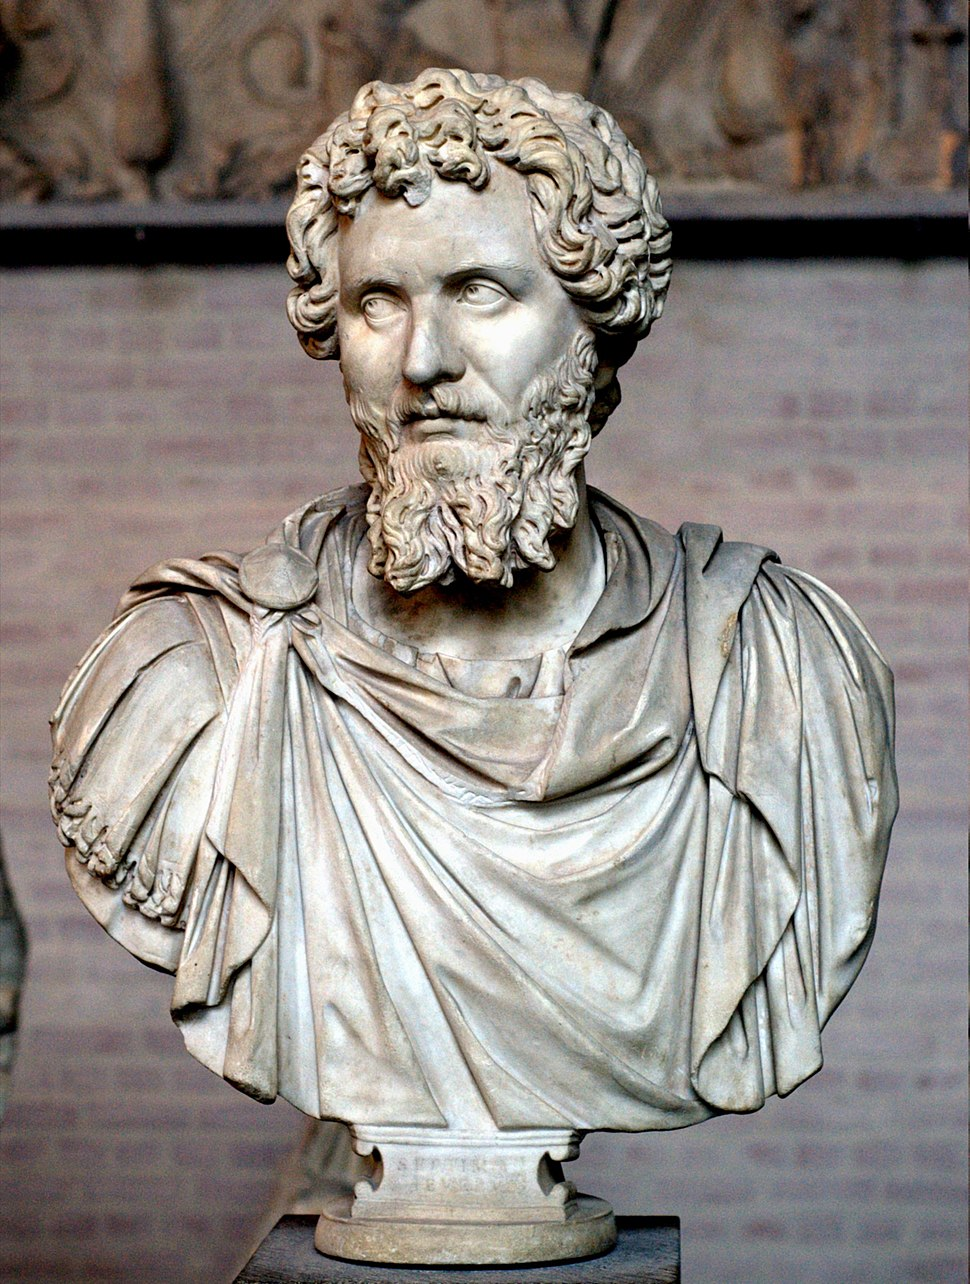 Septimius Severus Glyptothek Munich 357